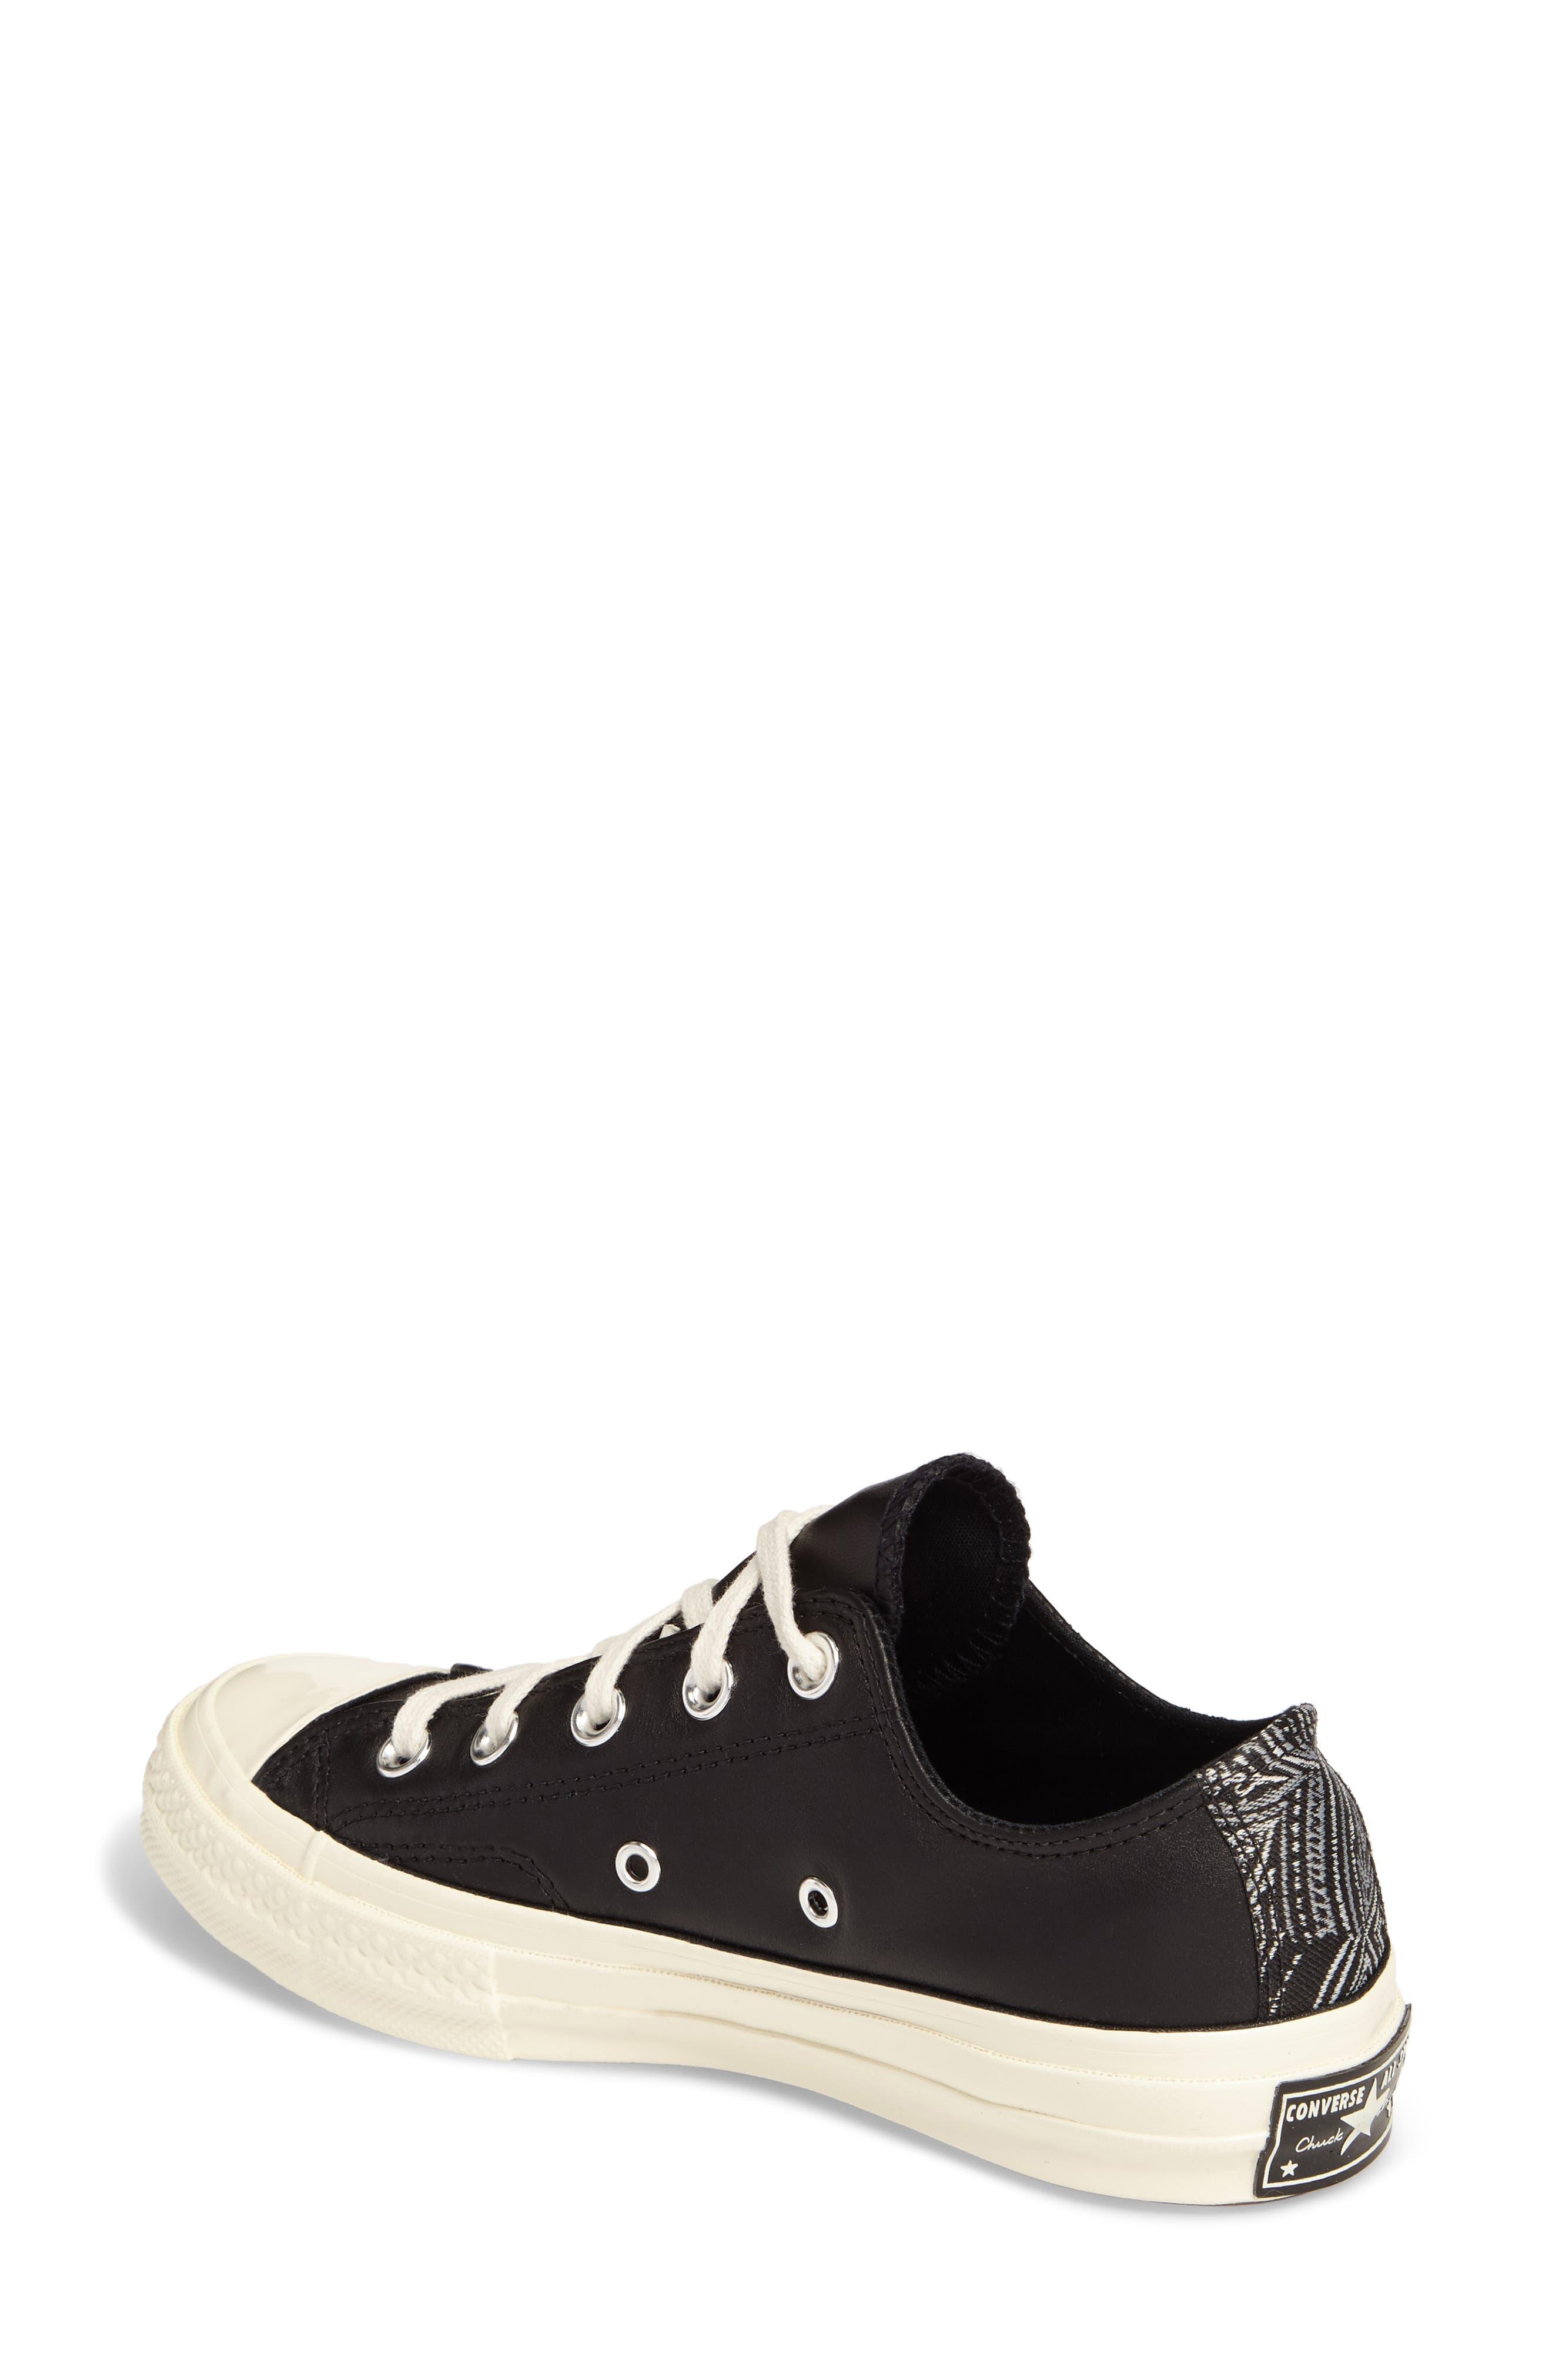 Chuck Taylor<sup>®</sup> All Star<sup>®</sup> Ox Genuine Calf Hair Sneaker,                             Alternate thumbnail 2, color,                             001